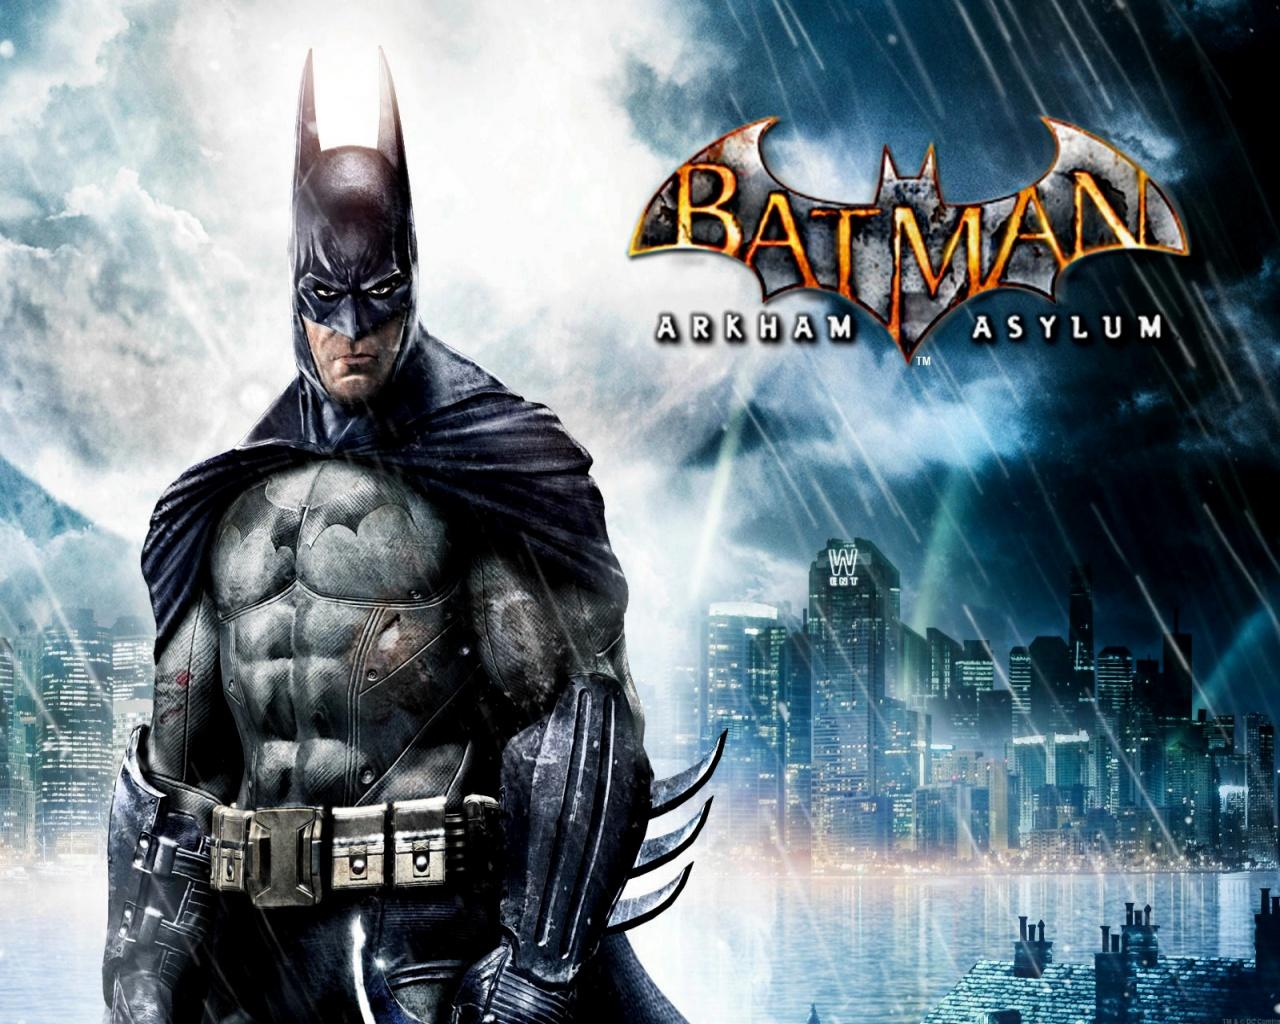 1280x1024 Batman Arkham Asylum desktop PC and Mac wallpaper 1280x1024